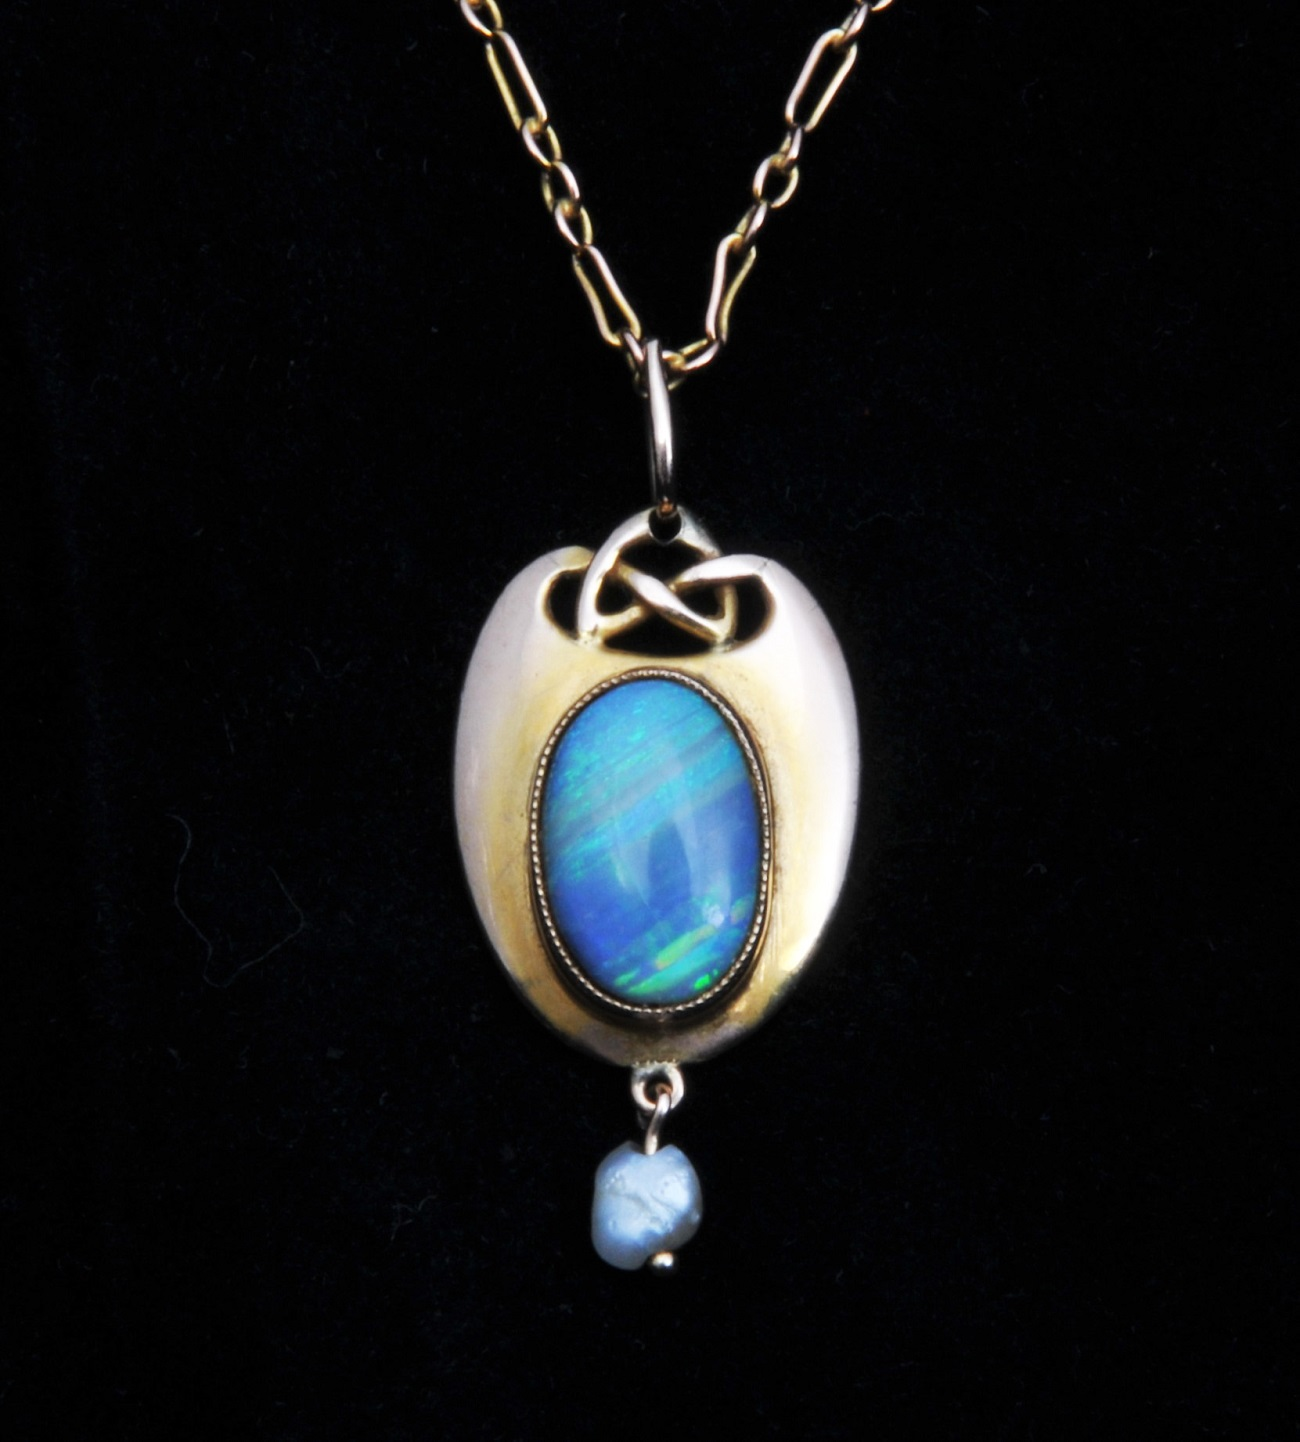 Archibald Knox style opal pendant